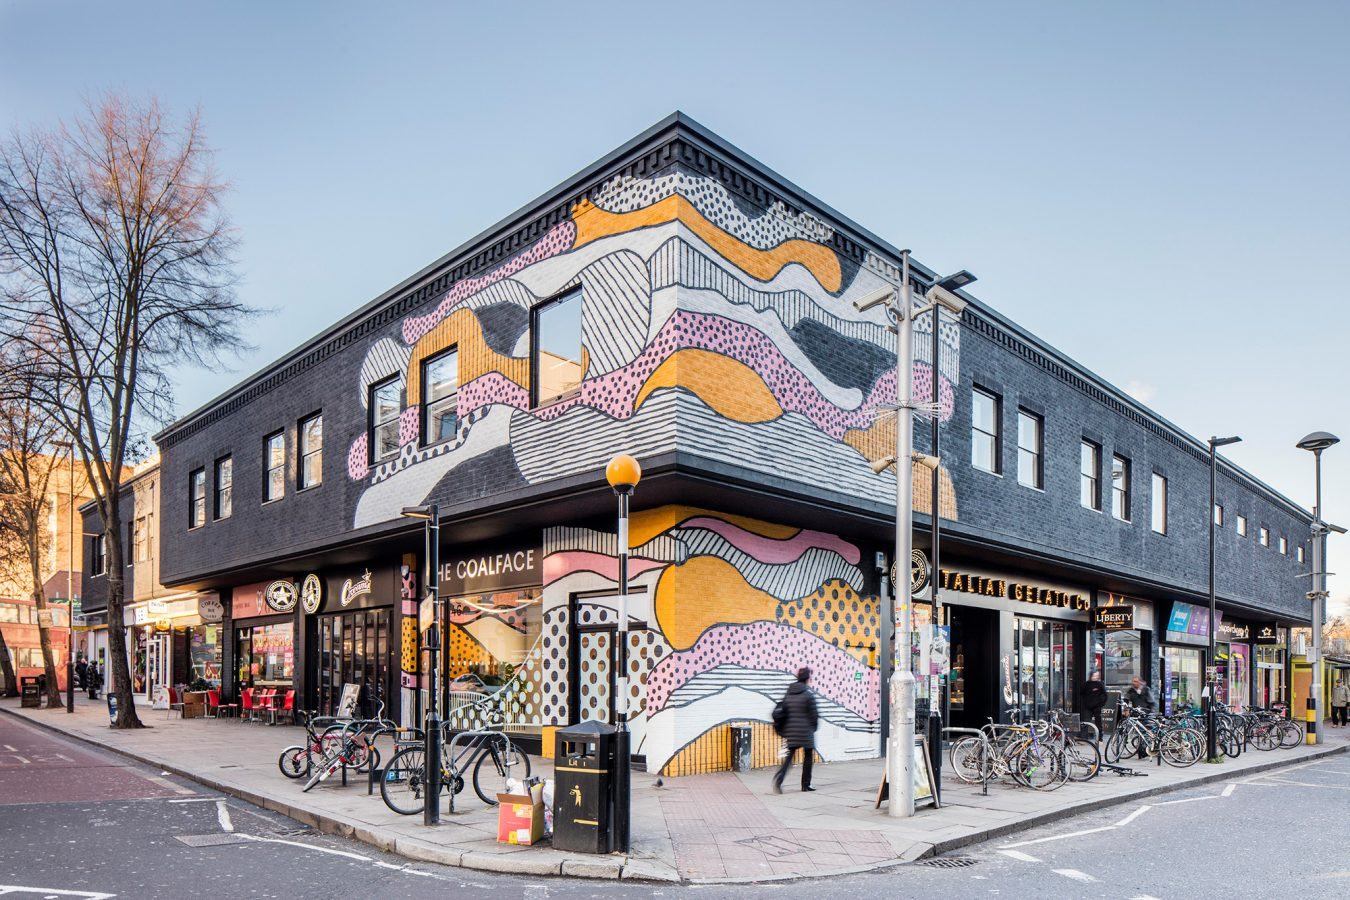 Graffiti wall design created in Finsbury Park